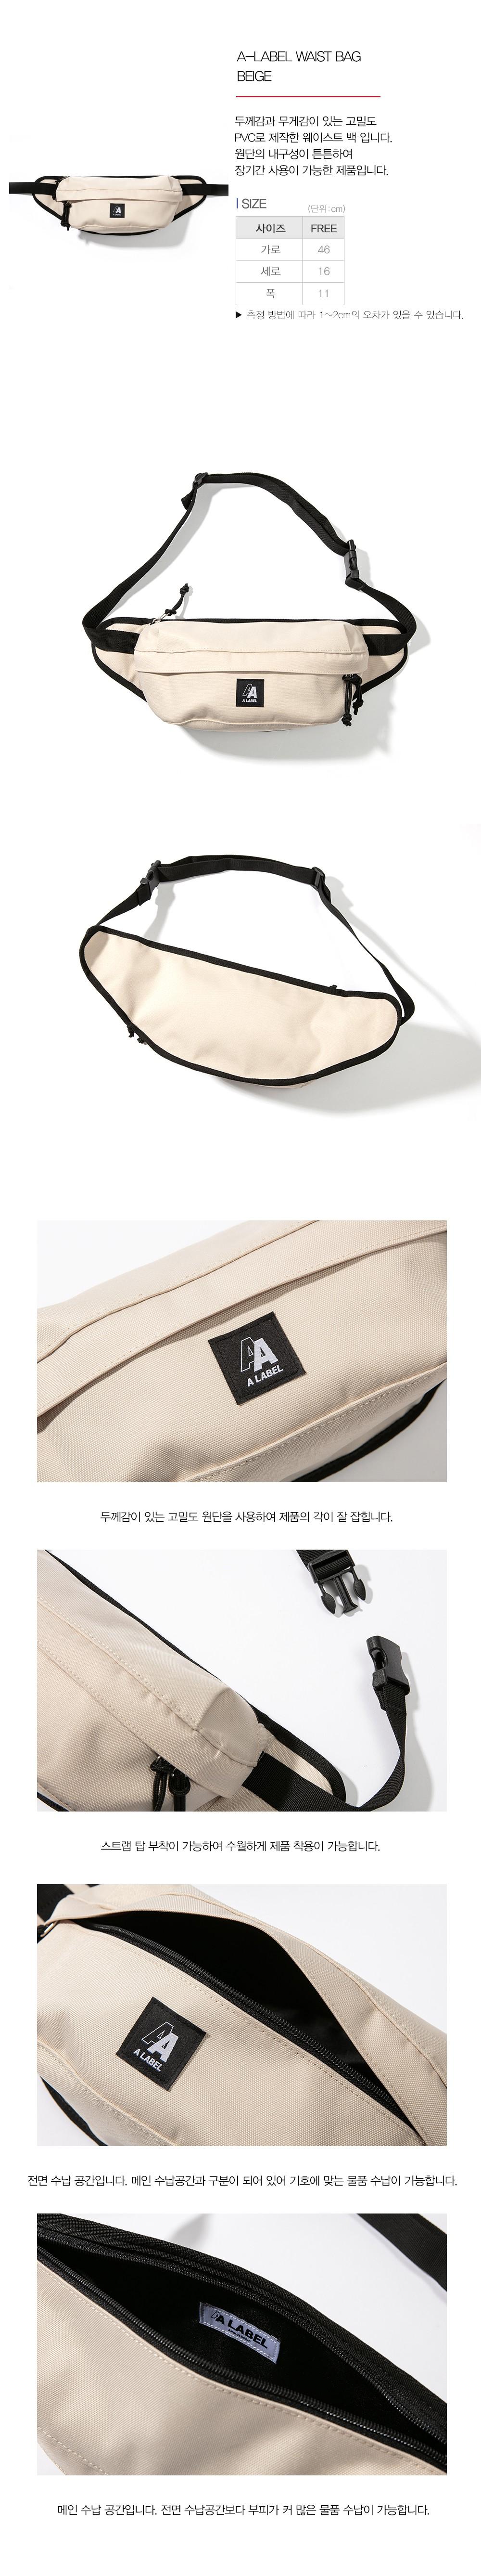 bag2_be_01.jpg